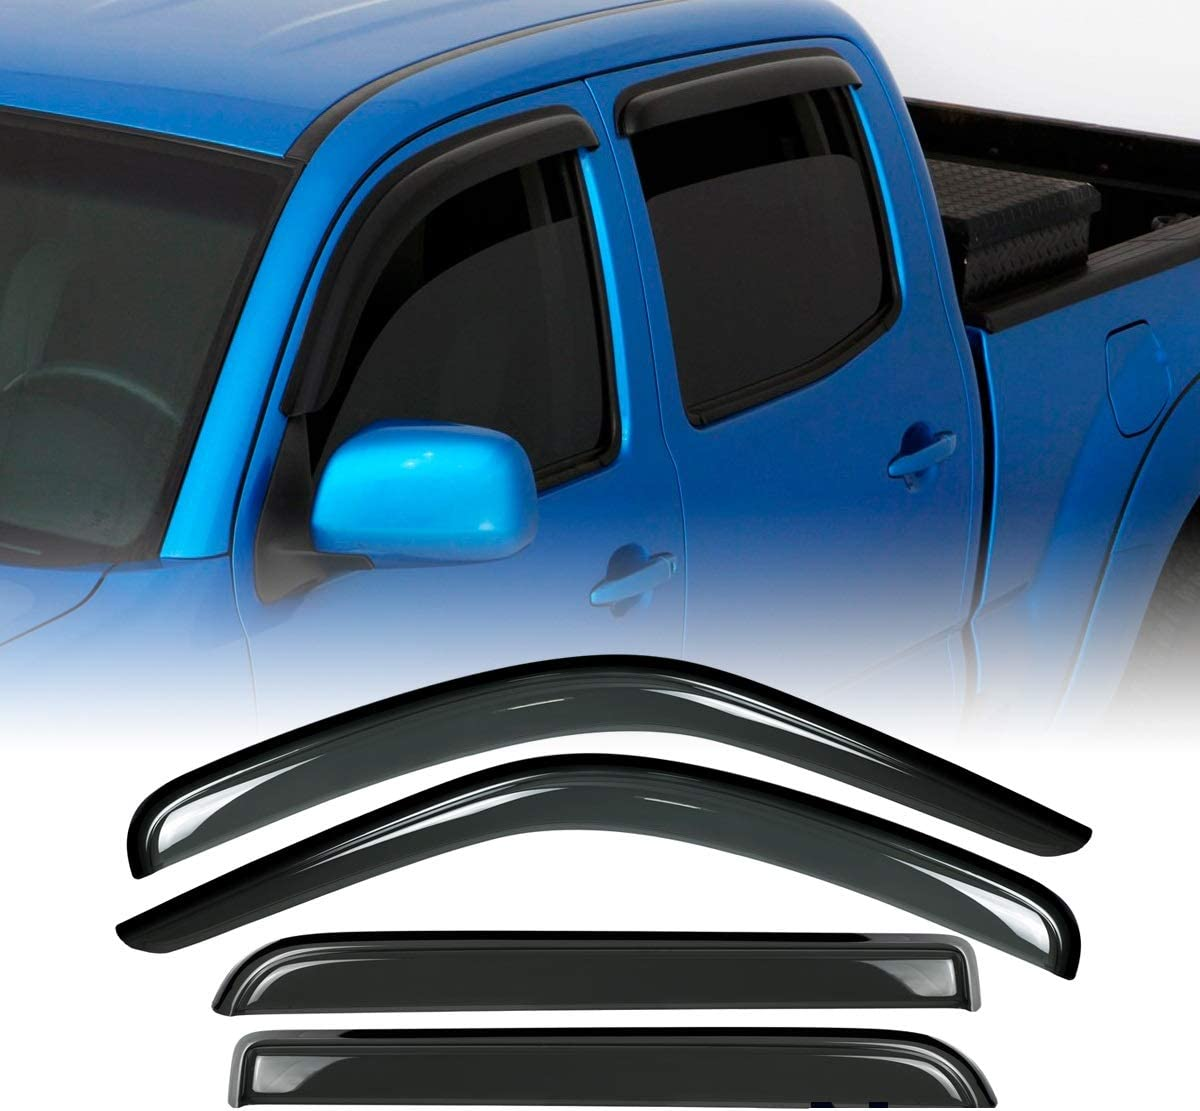 Deebior 4pcs for 95-04 Tacoma Access//Extended Cab Sun//Rain Guard Vent Shade Window Visor